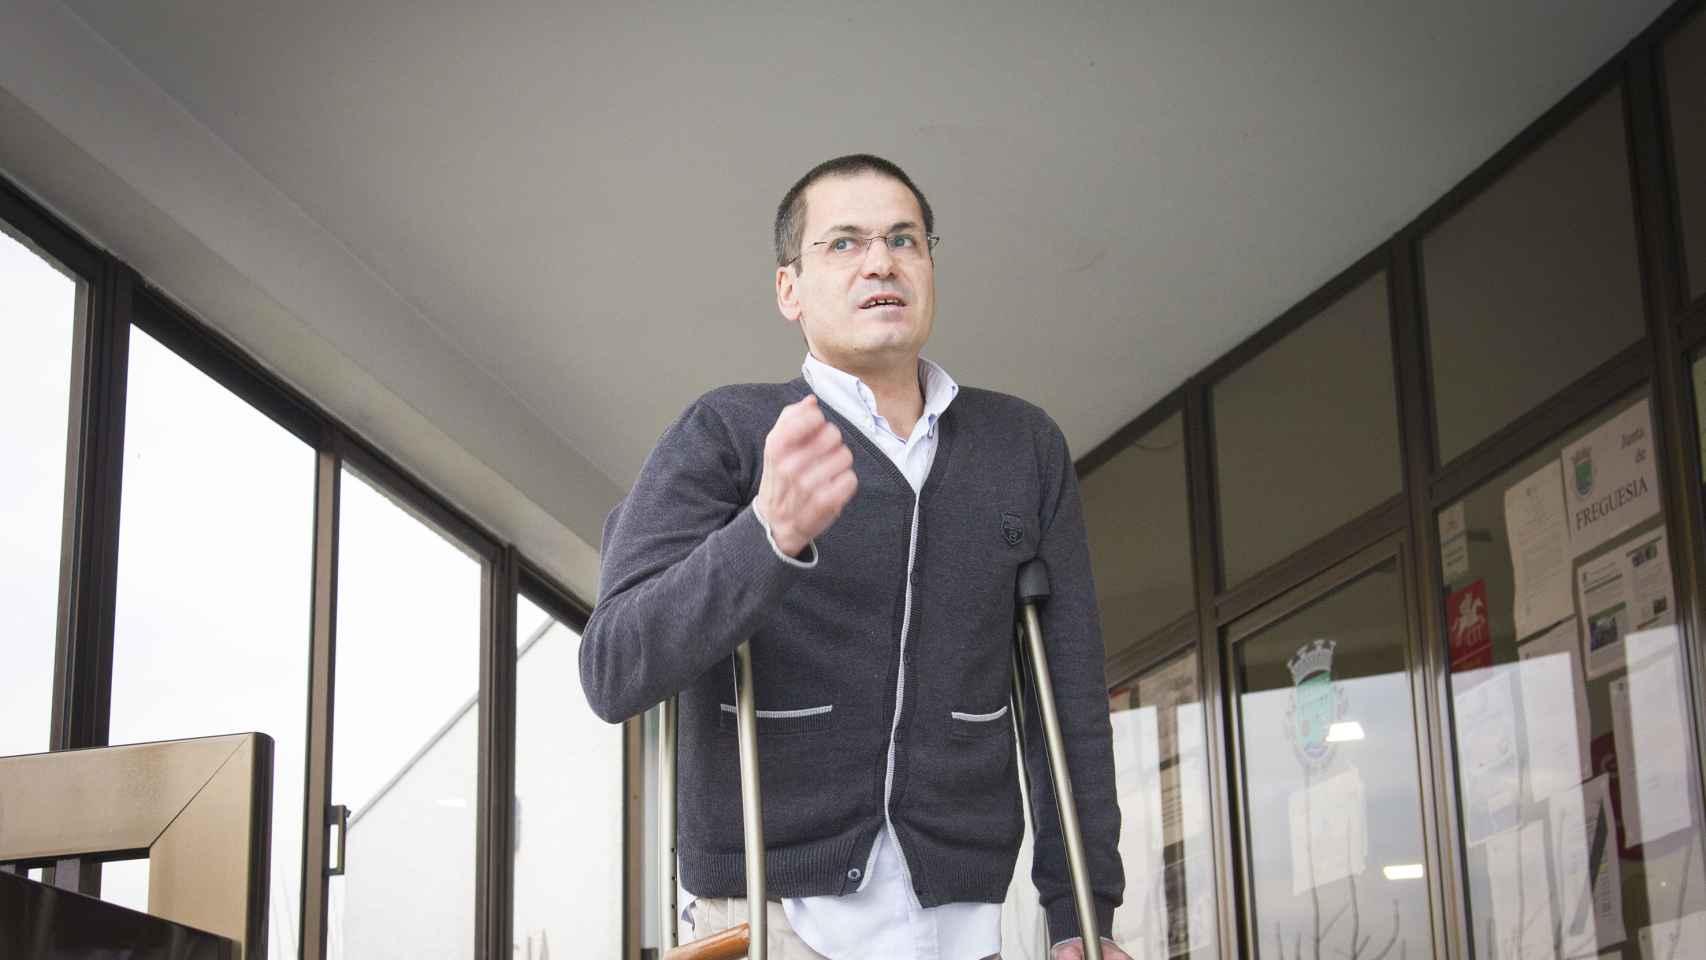 Raul Peixoto, presidente de la Junta Municipal de Serzedelo.